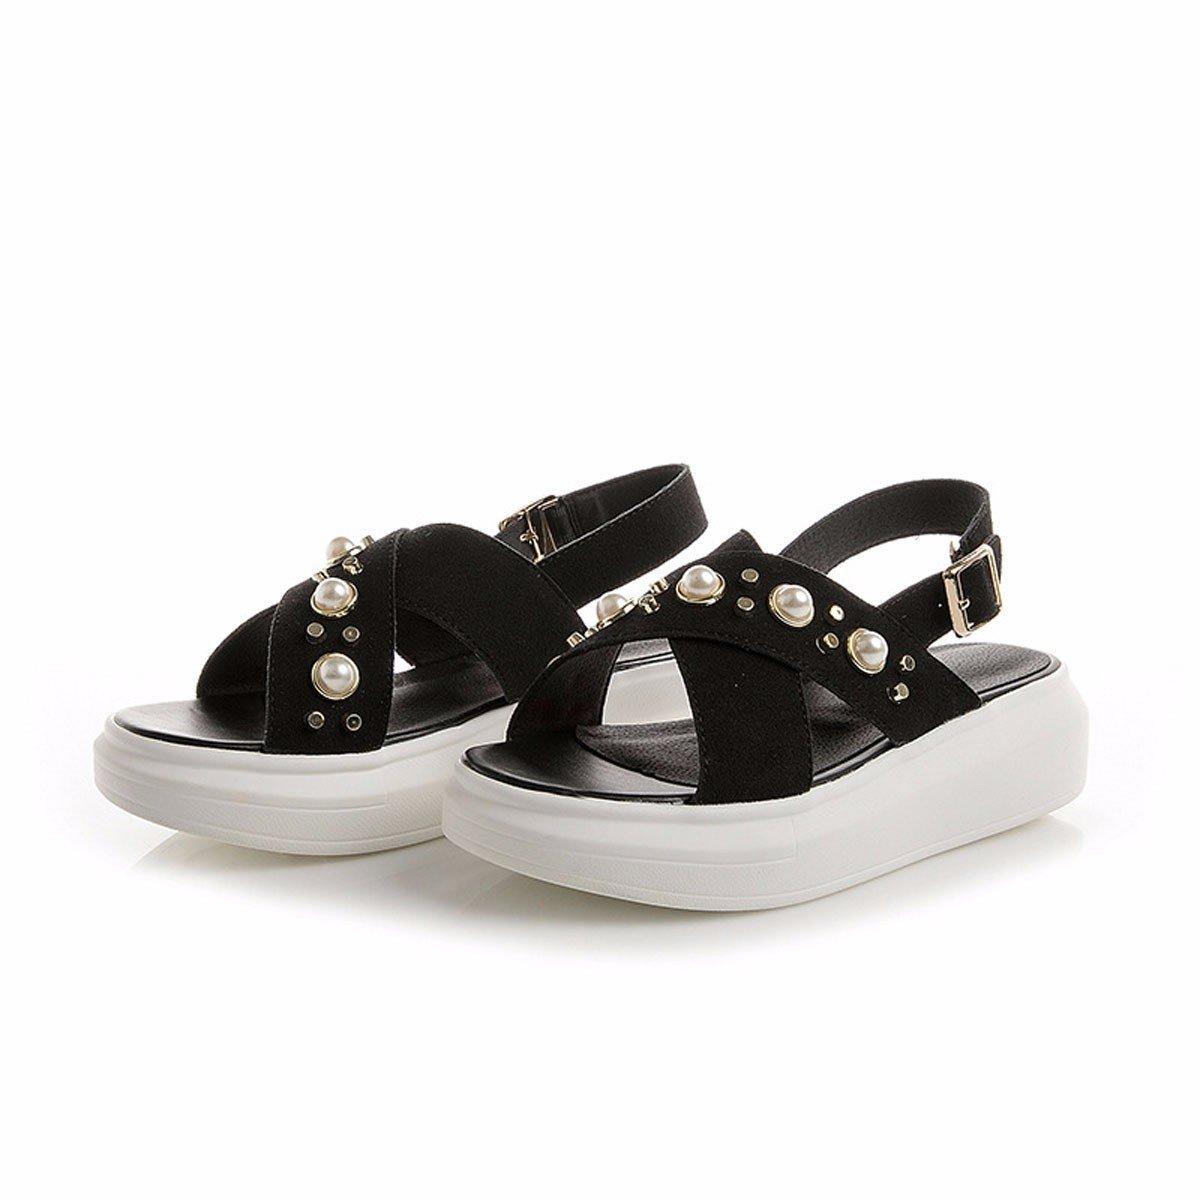 HBDLH Damenschuhe atmungsaktiv bequem Schuhe Die Muffins Dicken Hintern Sandalen Flache Schuhe Metallknöpfe Summer.